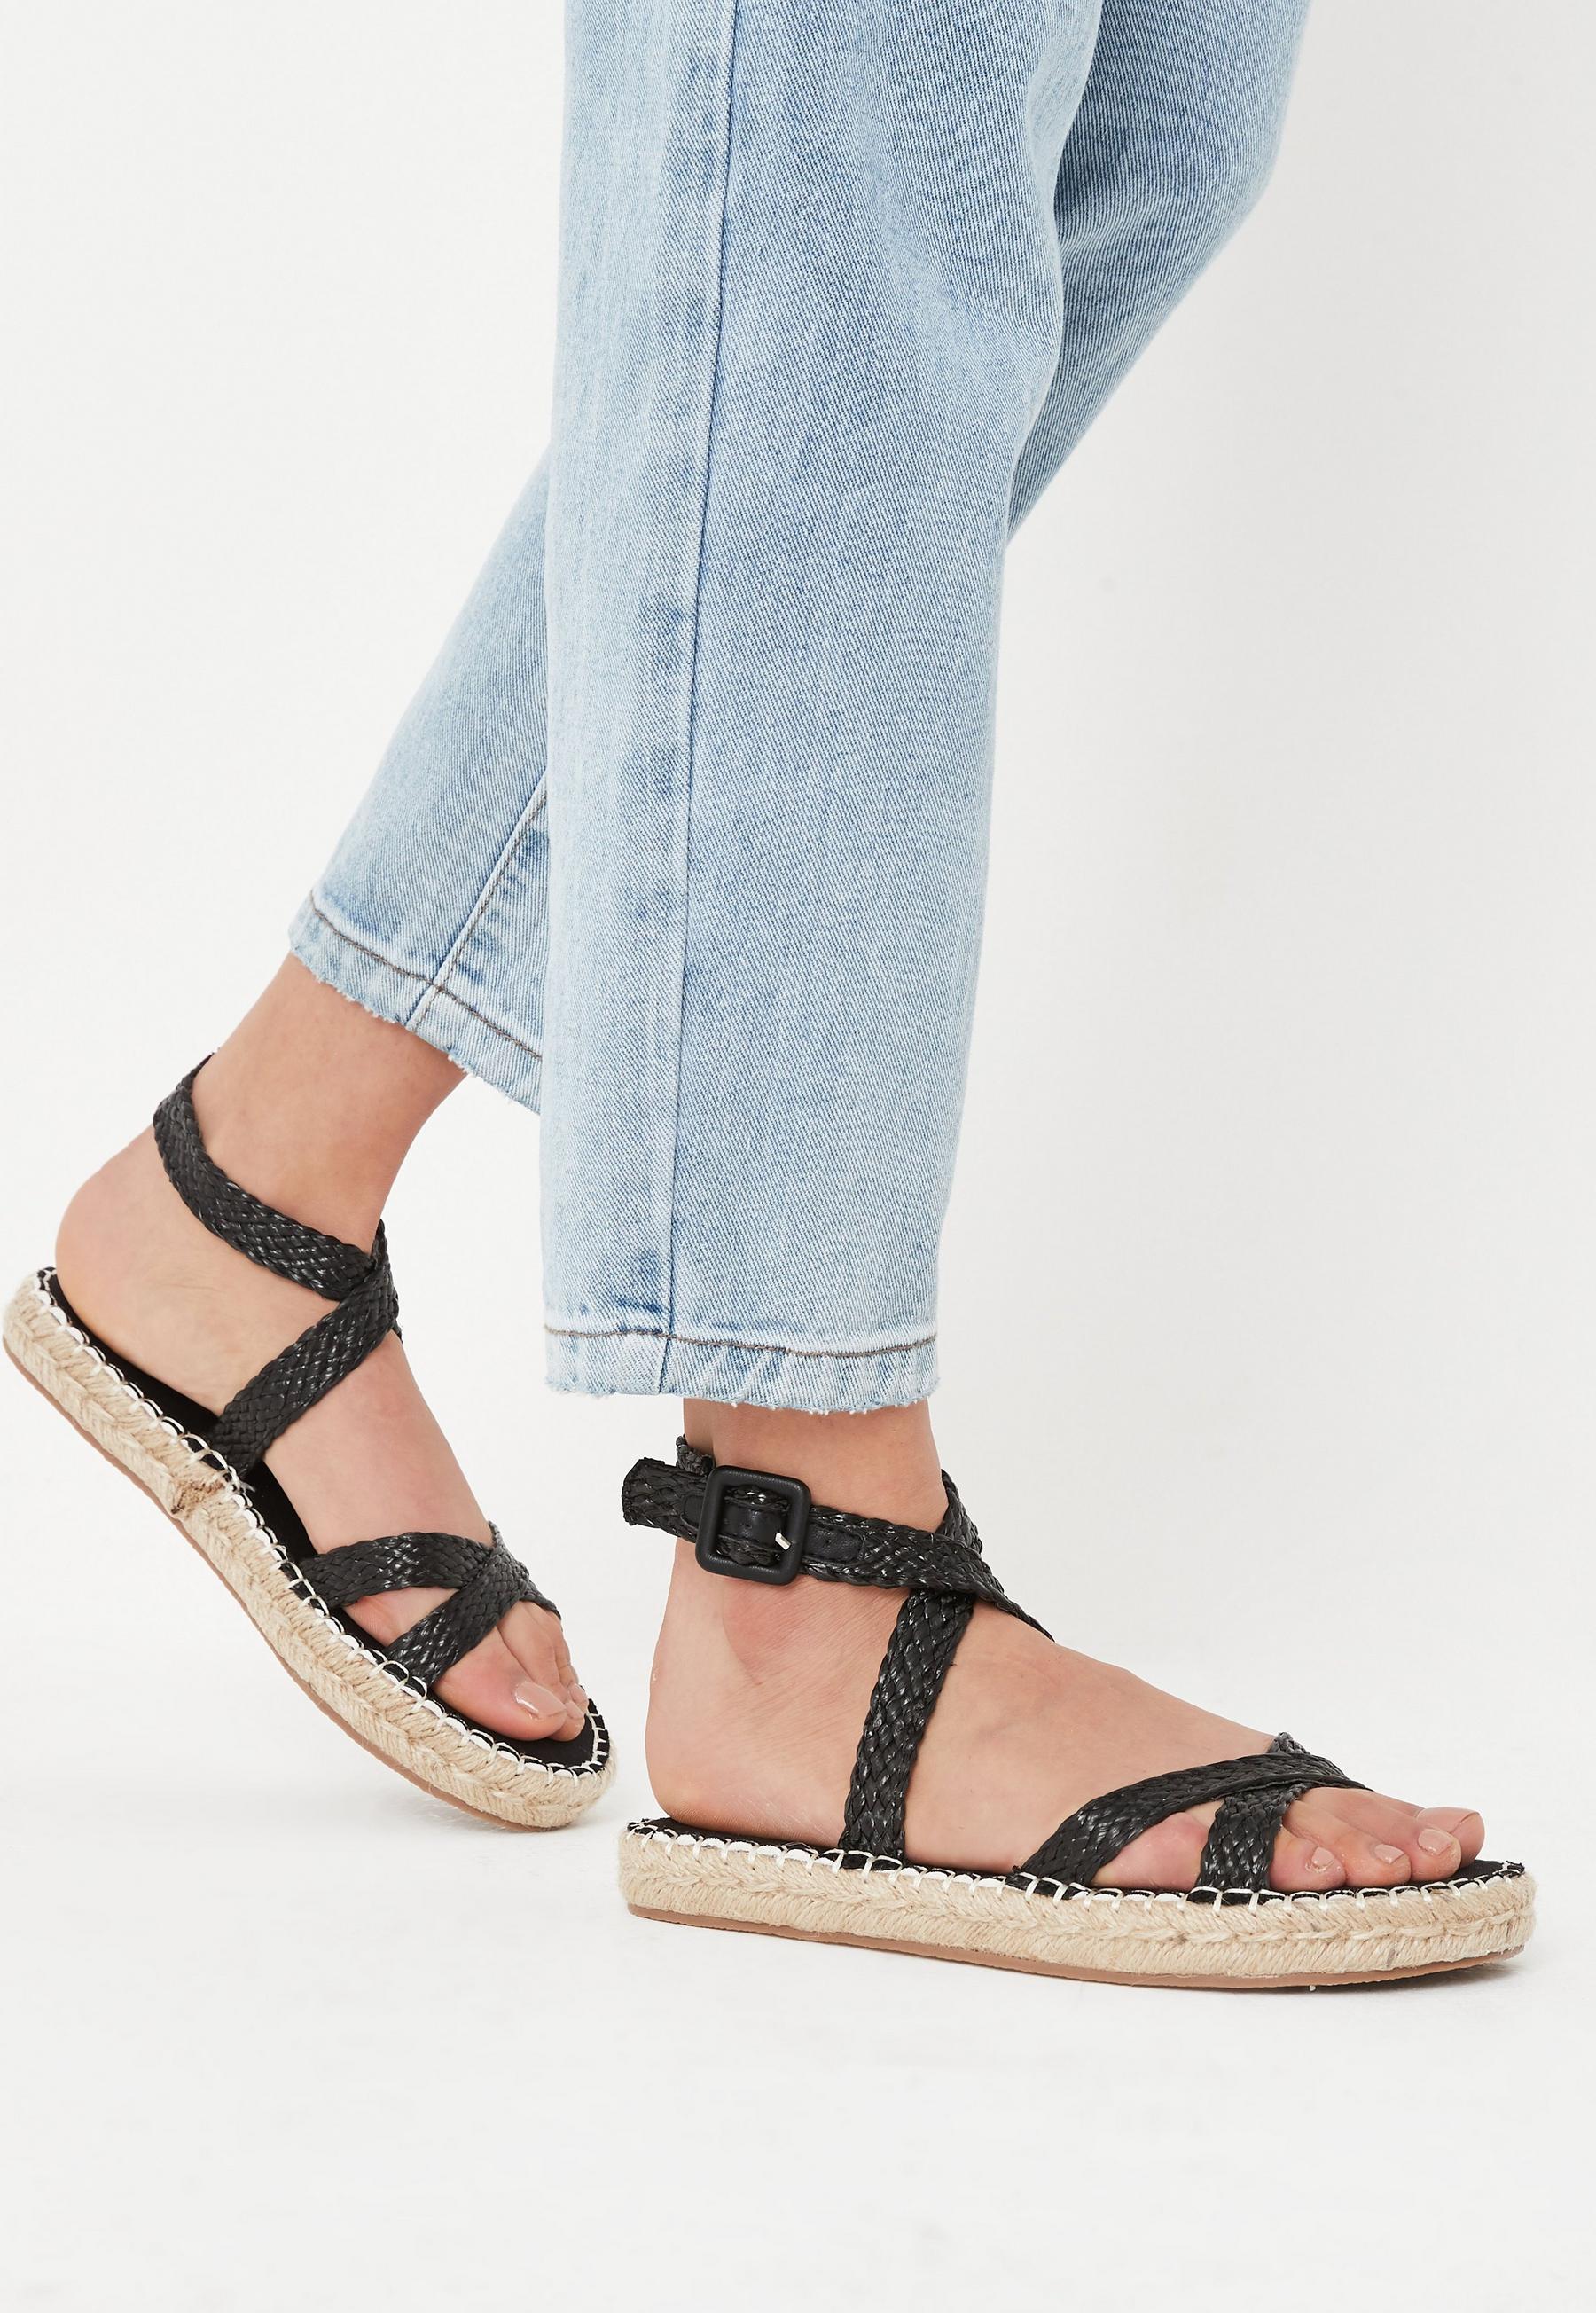 black raffia cross over flat sandals £30.00